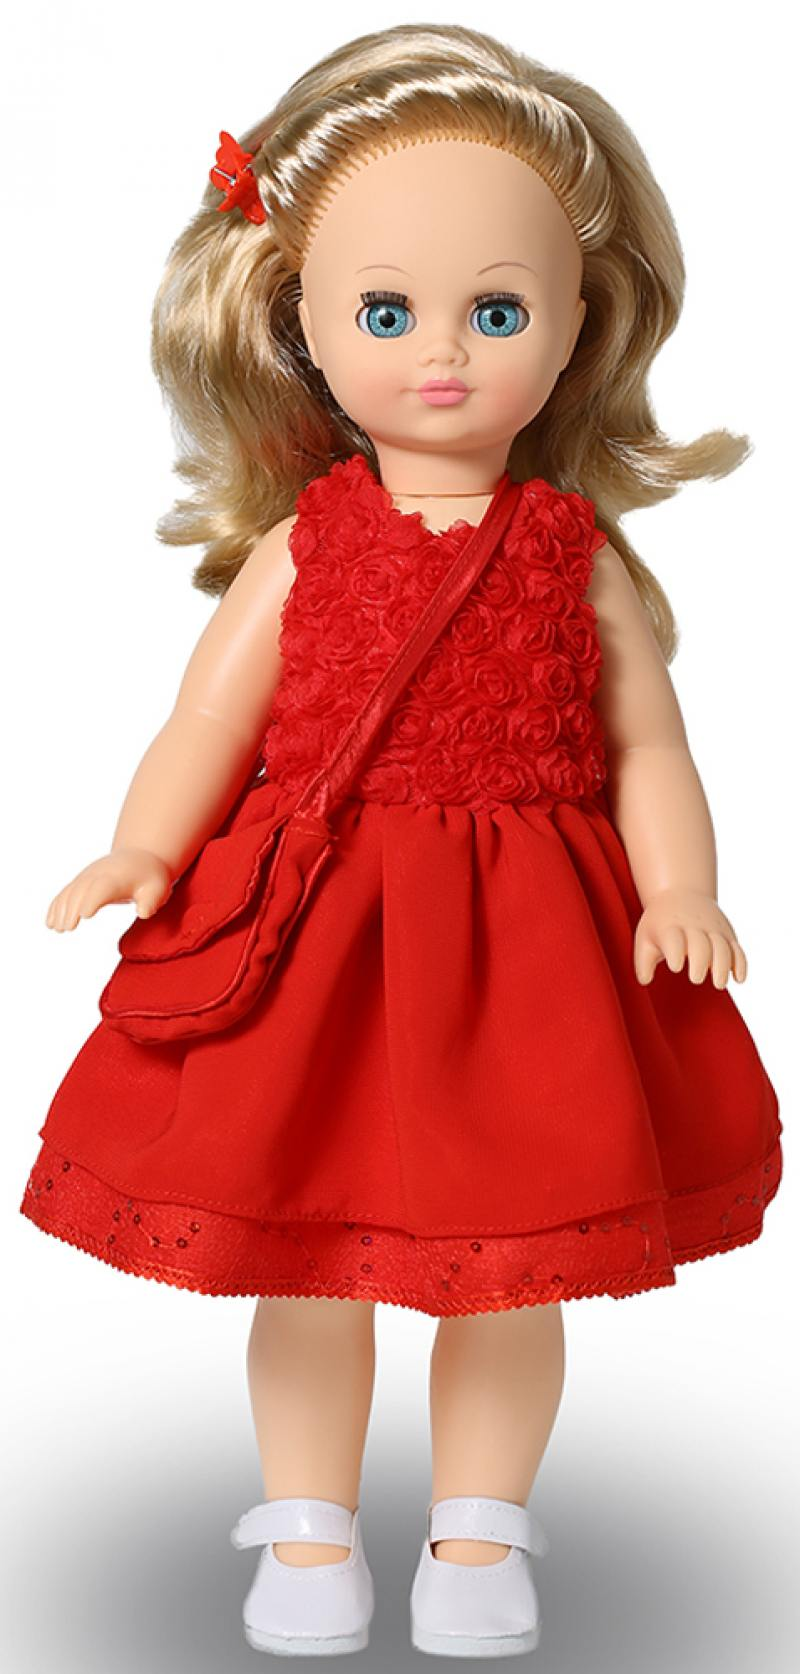 Кукла ВЕСНА Лиза 6 (озвученная) В2959/